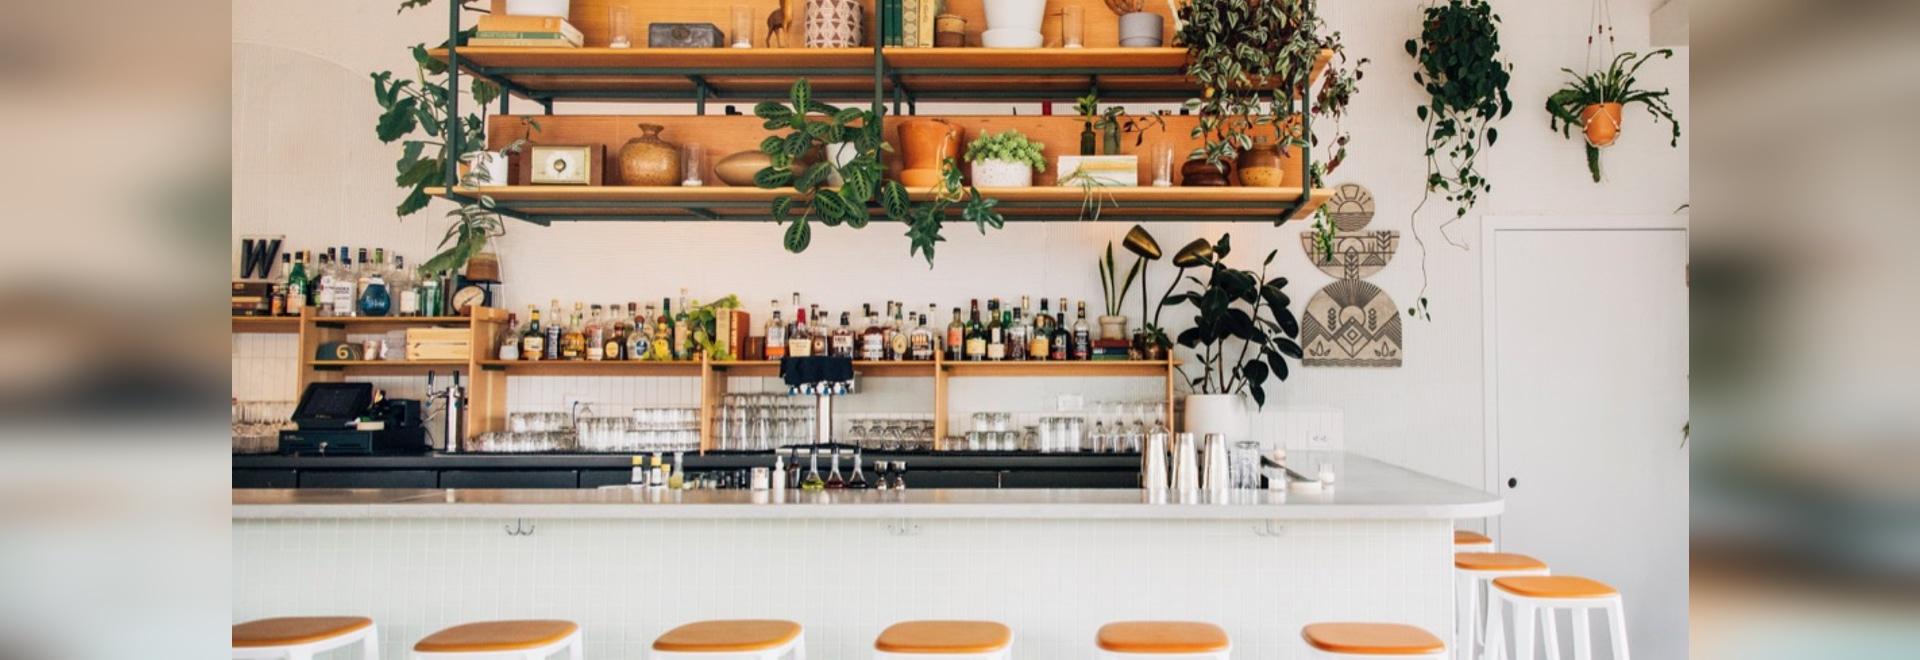 Bar West a Portland, con gli sgabelli TOOU Bar con seduta imbottita.